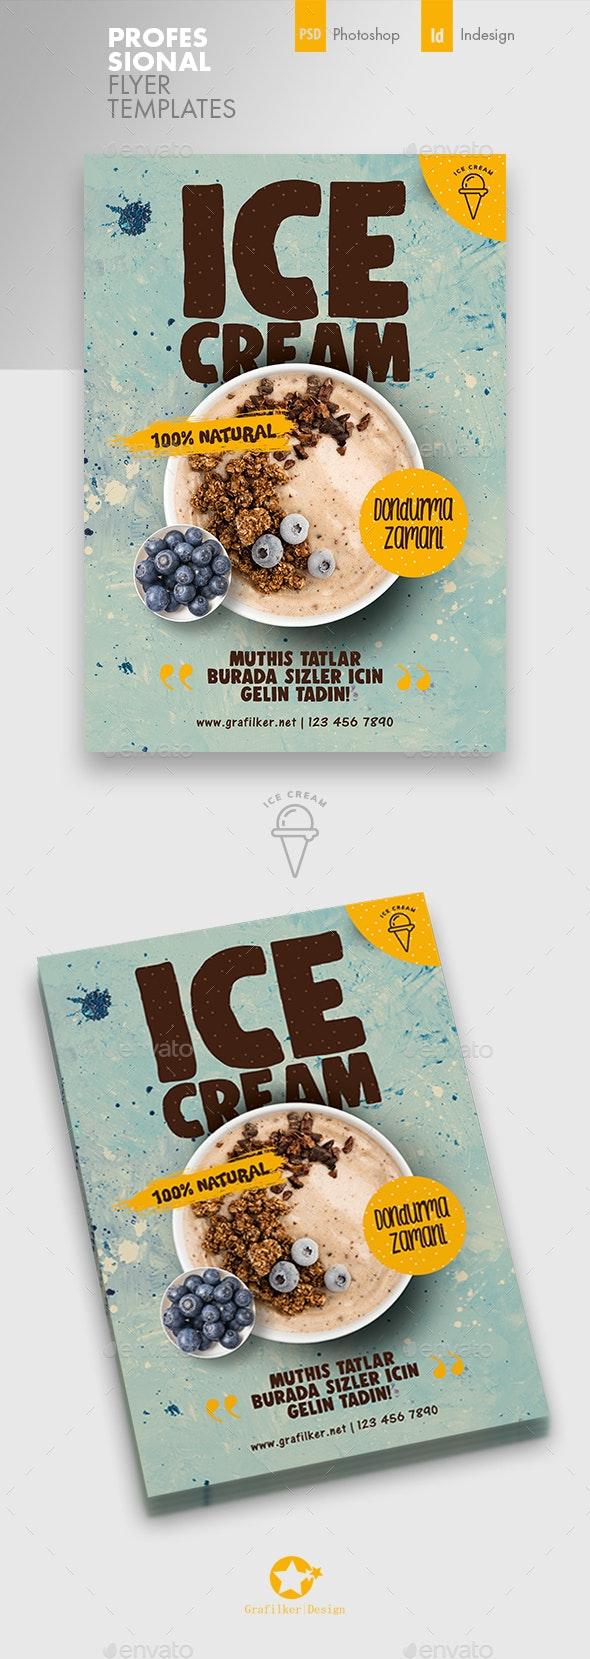 Ice Cream Flyer Templates - Corporate Flyers